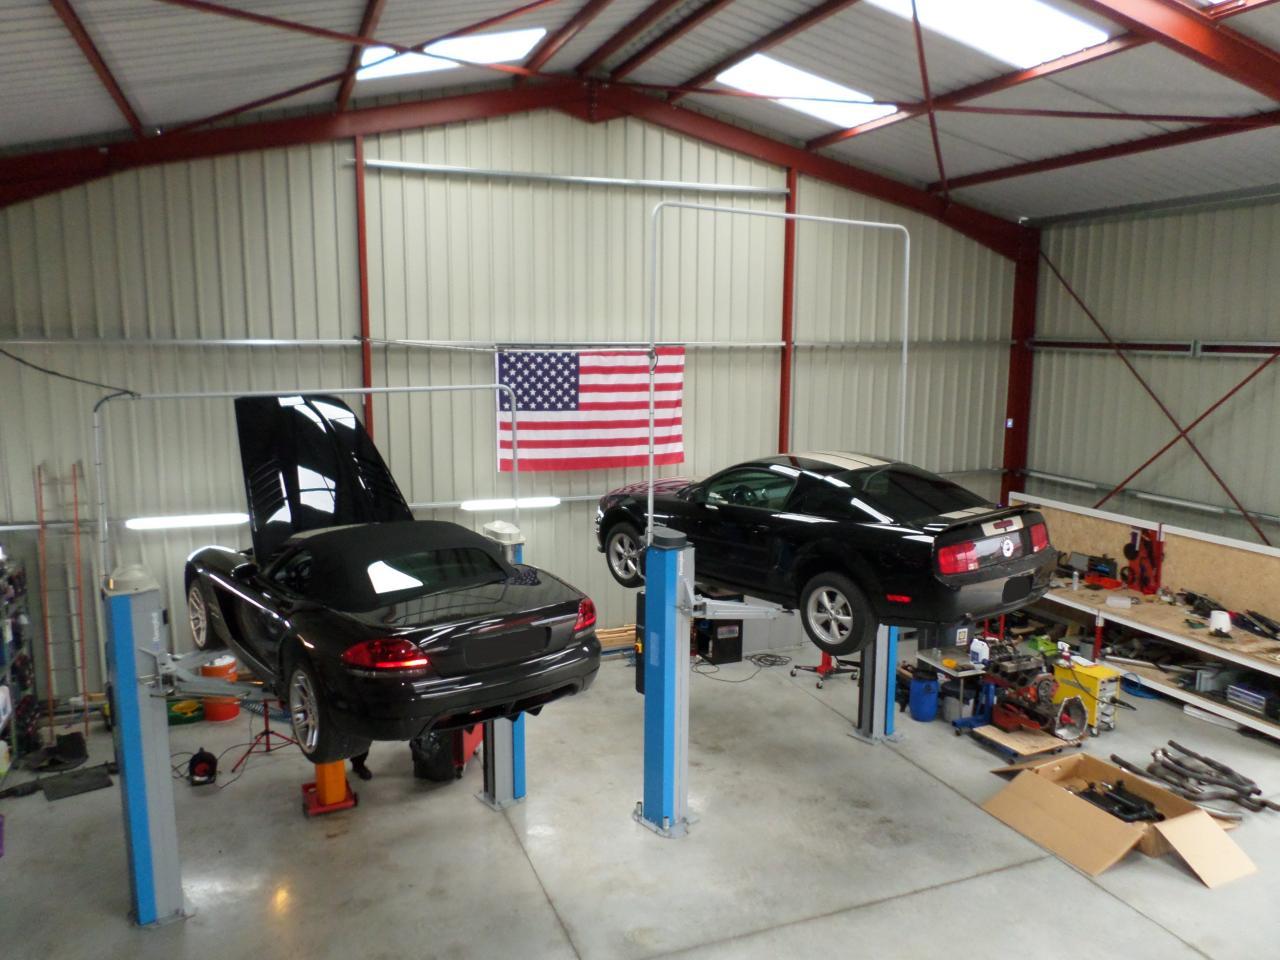 Viper SRT-10 - Ford Mustang GT